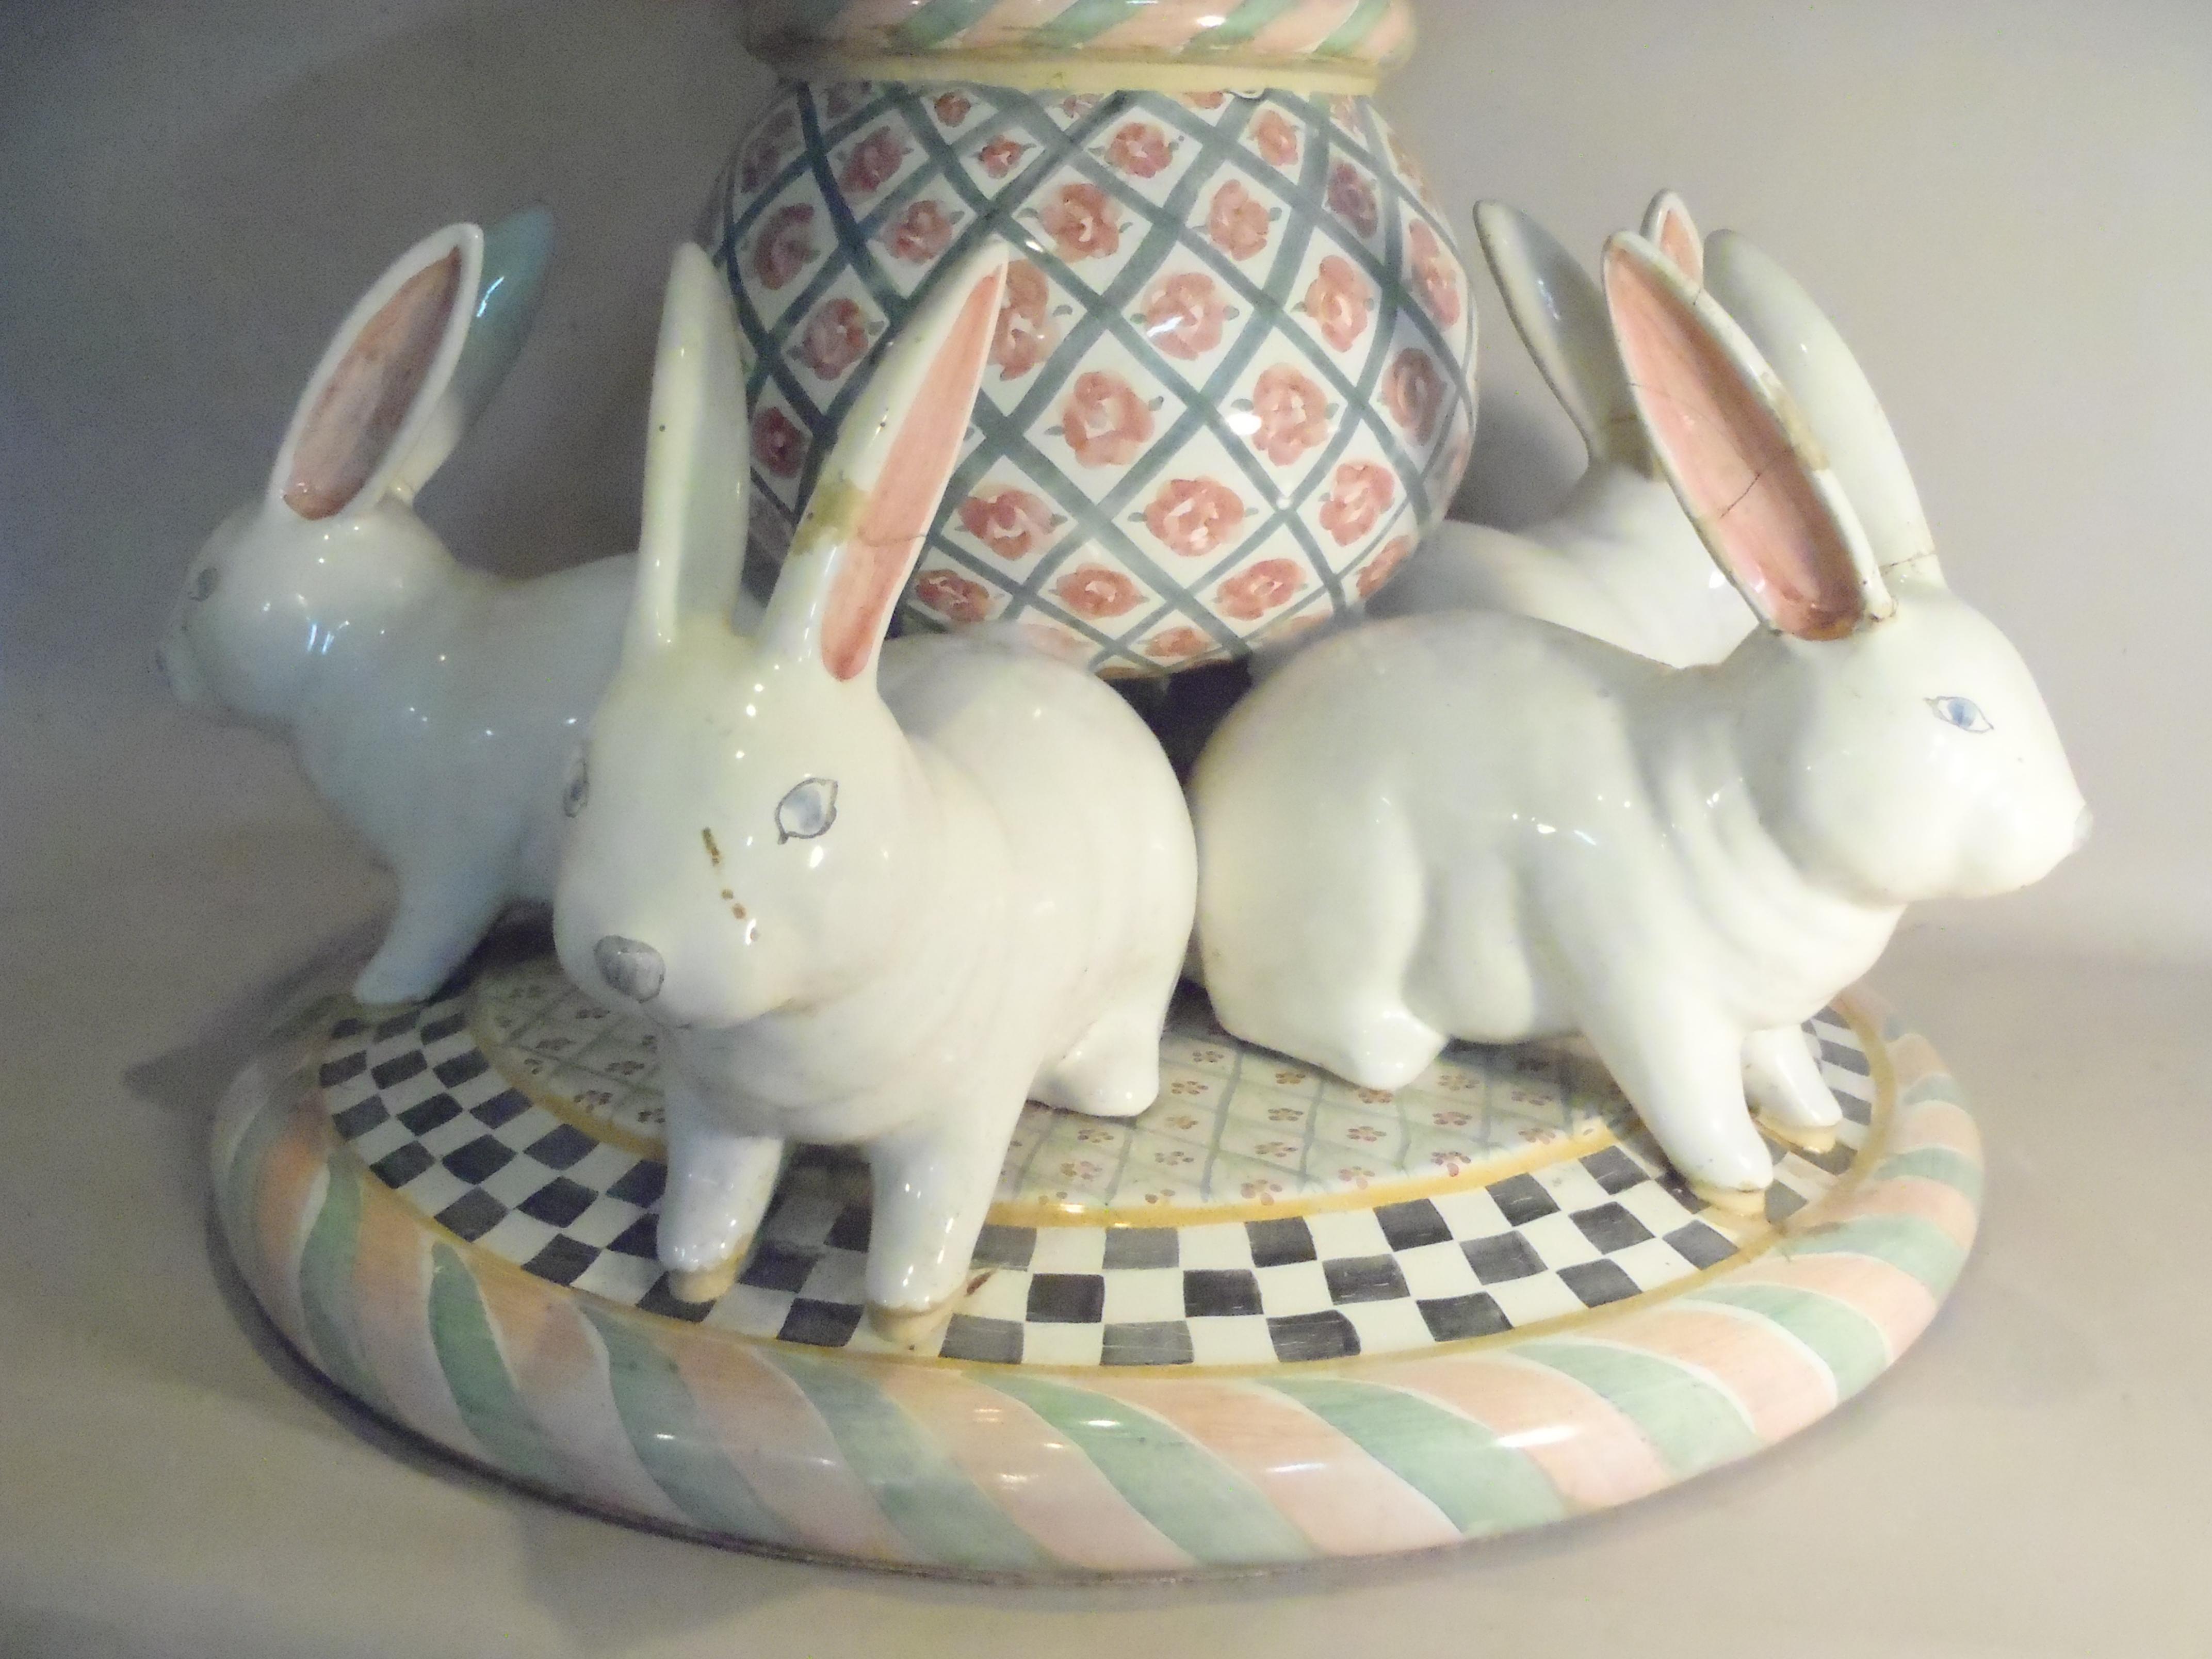 MacKenzie-Childs rabbit table base